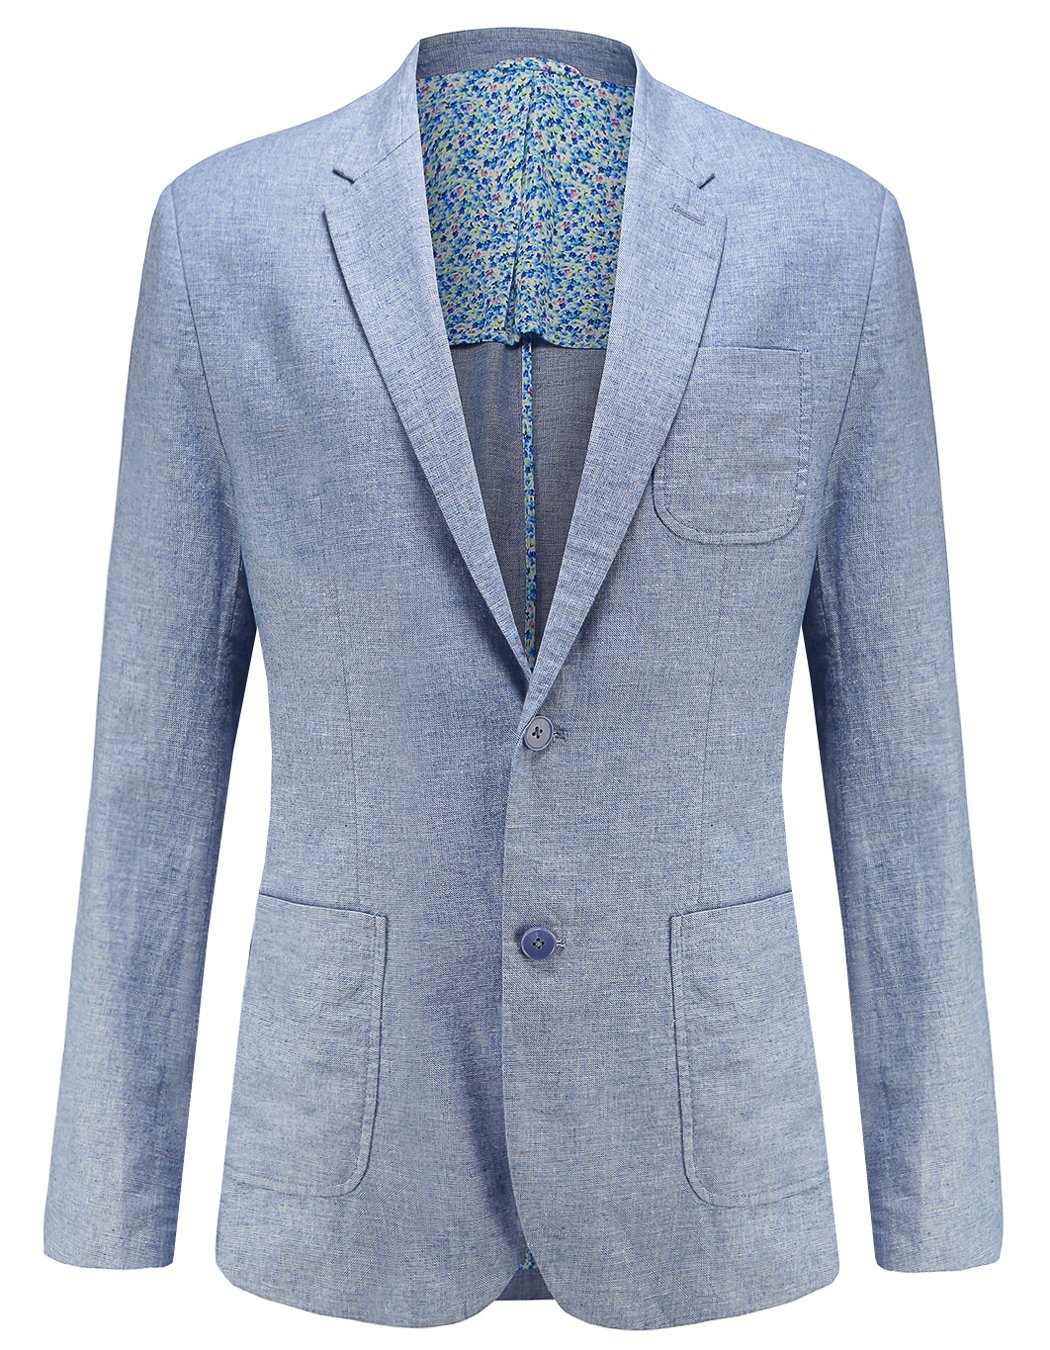 utcoco Mens Fashion Linen Slim Fit Lightweight 2 Button Sports Coat Suit Jacket (Medium, Blue)